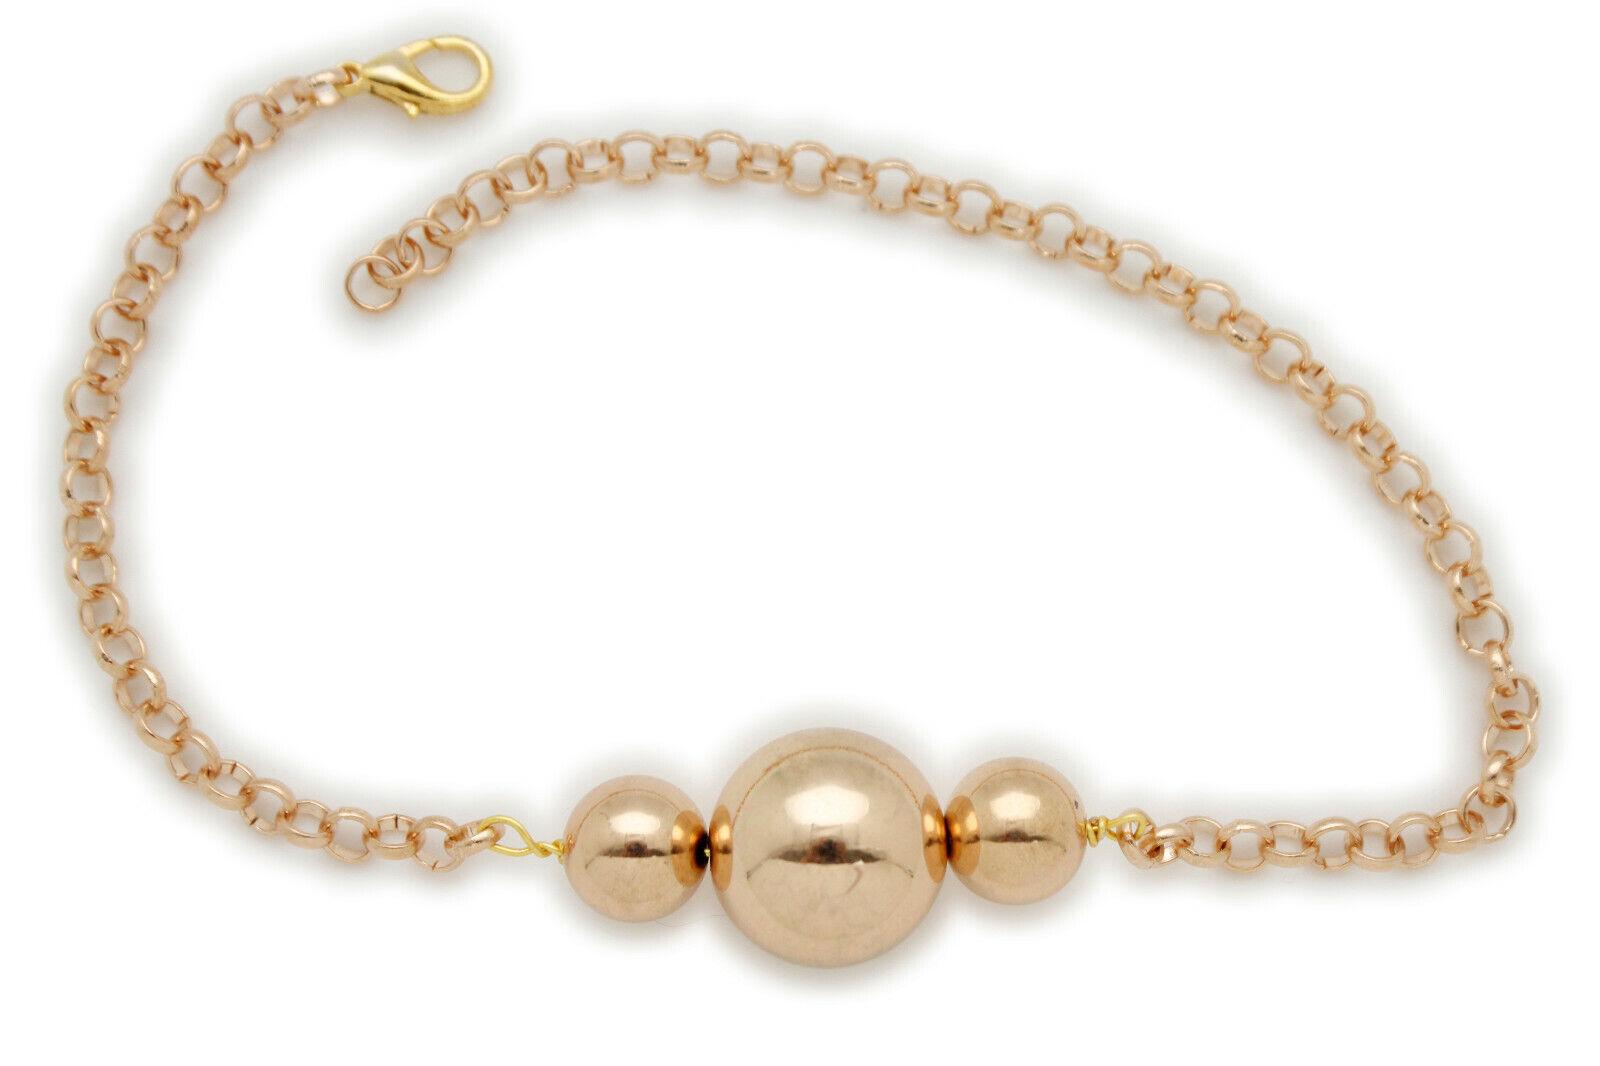 Rocker Women Gold Metal Chain Boot Bracelet Shoe 3 Ball Beads Charm Band Jewelry